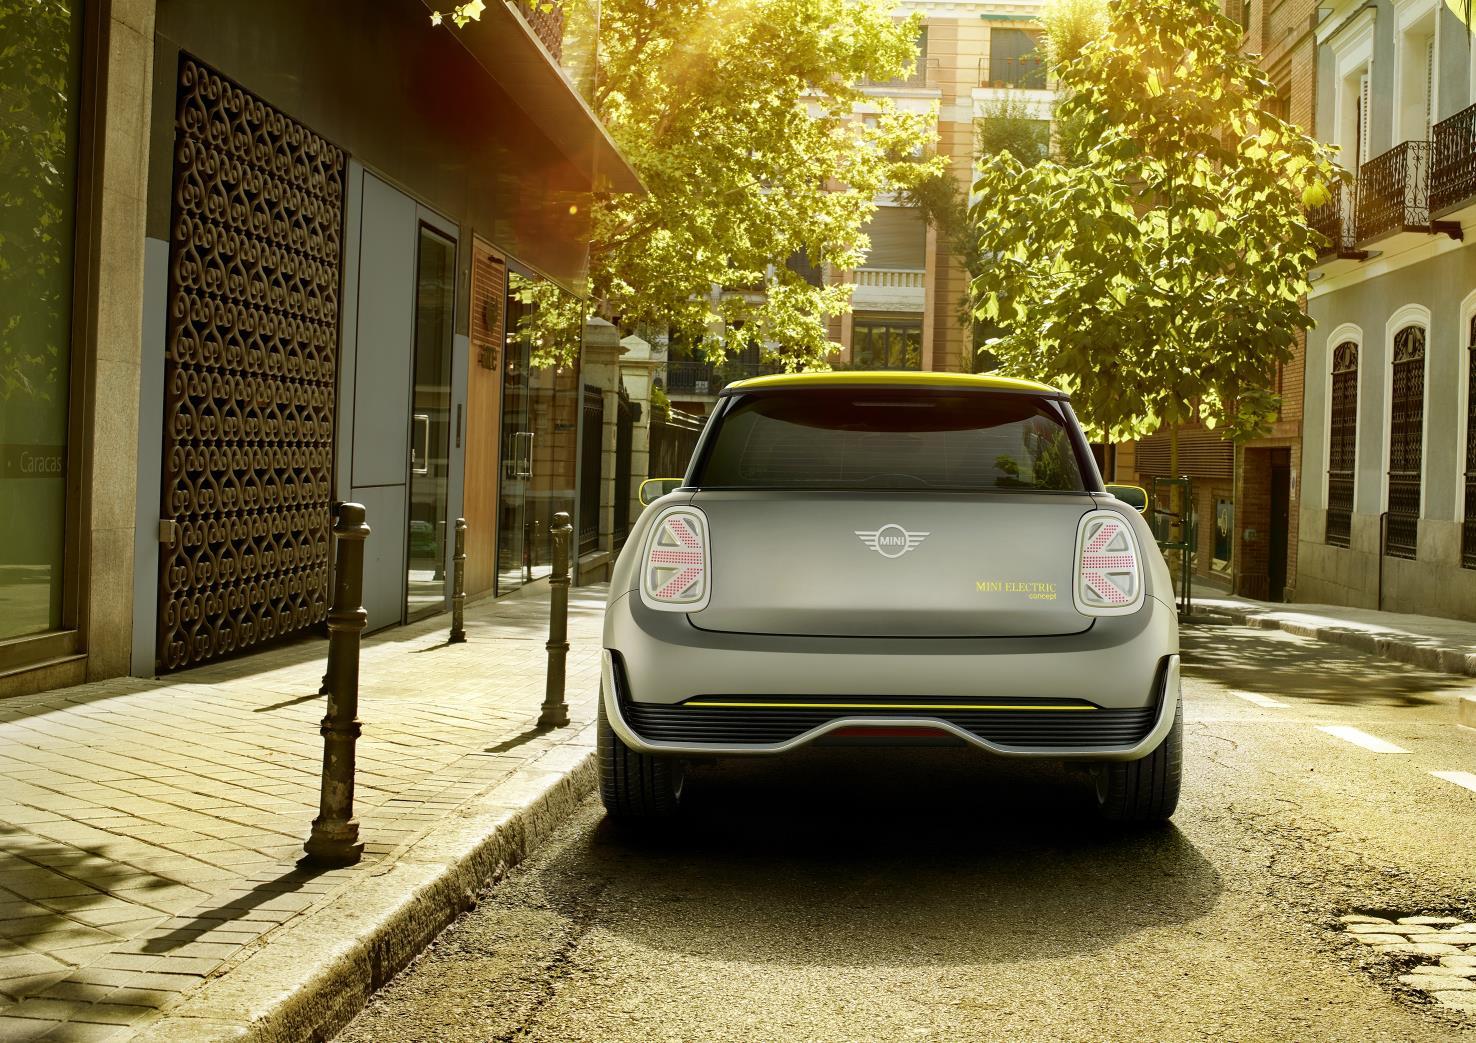 2017 Mini Electric Concept rear end